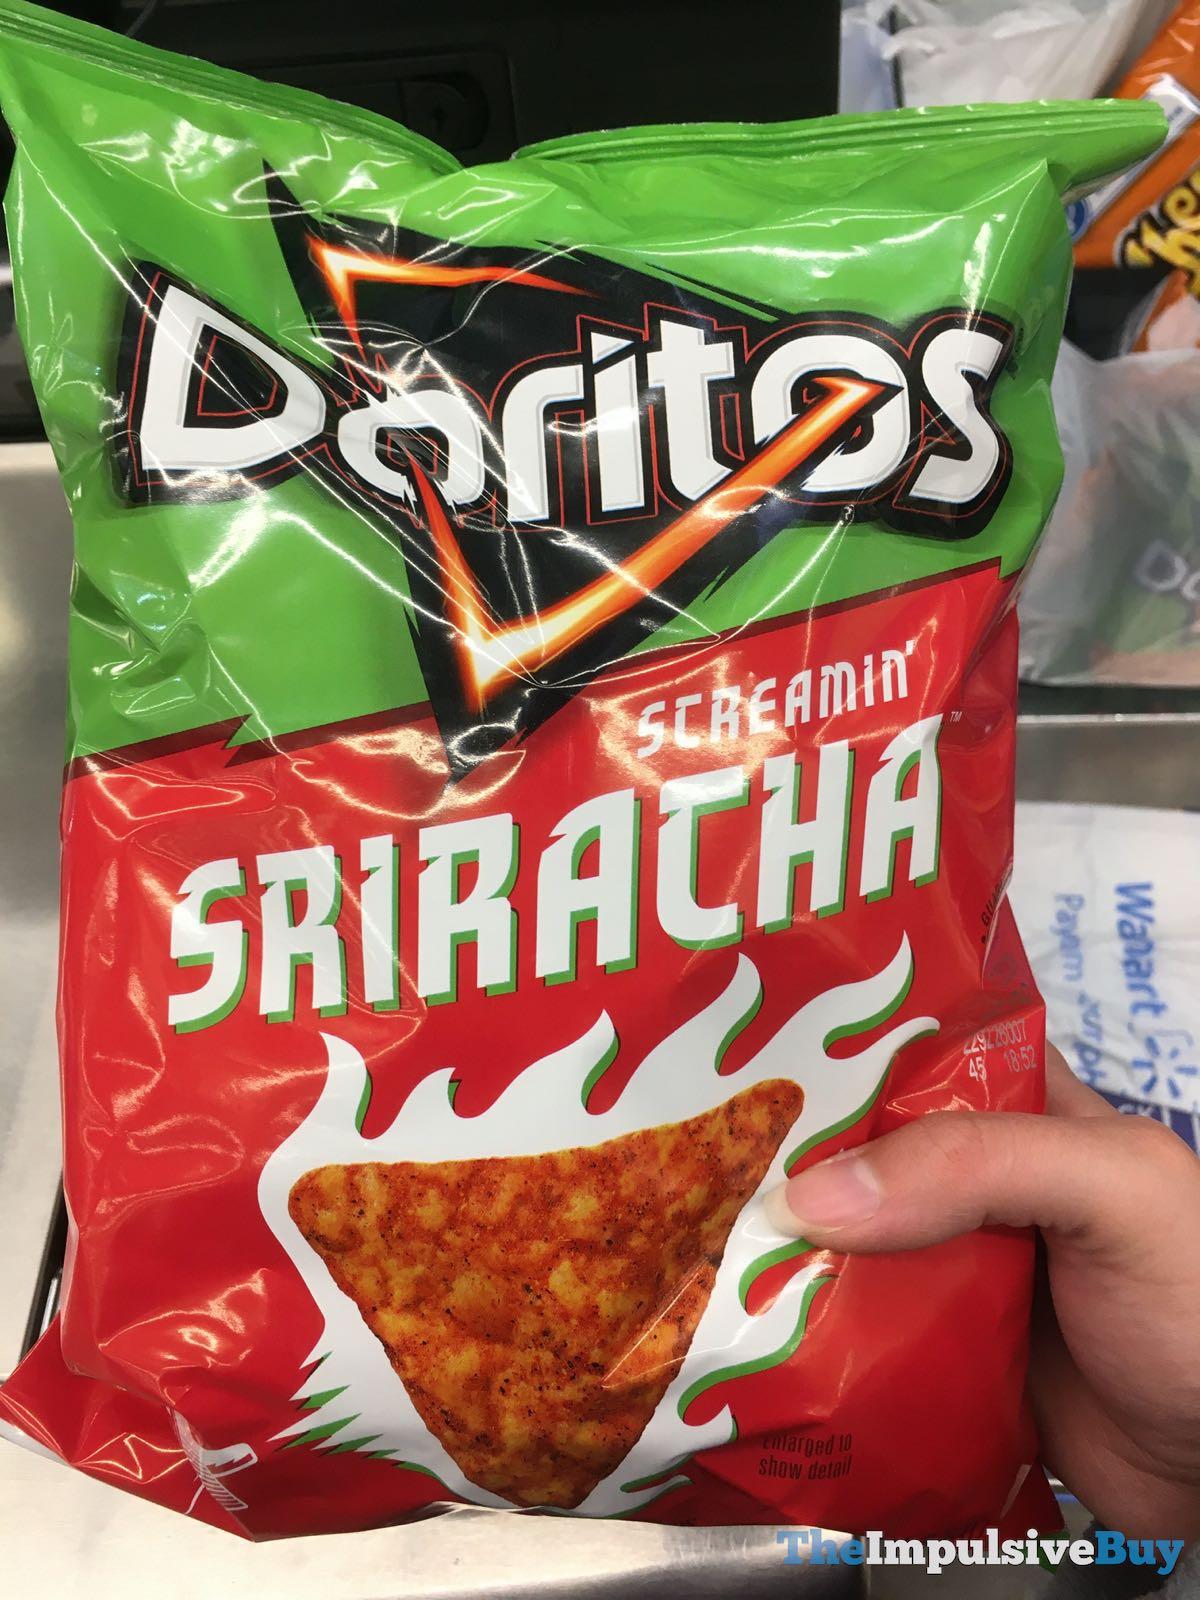 SPOTTED: Doritos Screamin' Sriracha - The Impulsive Buy